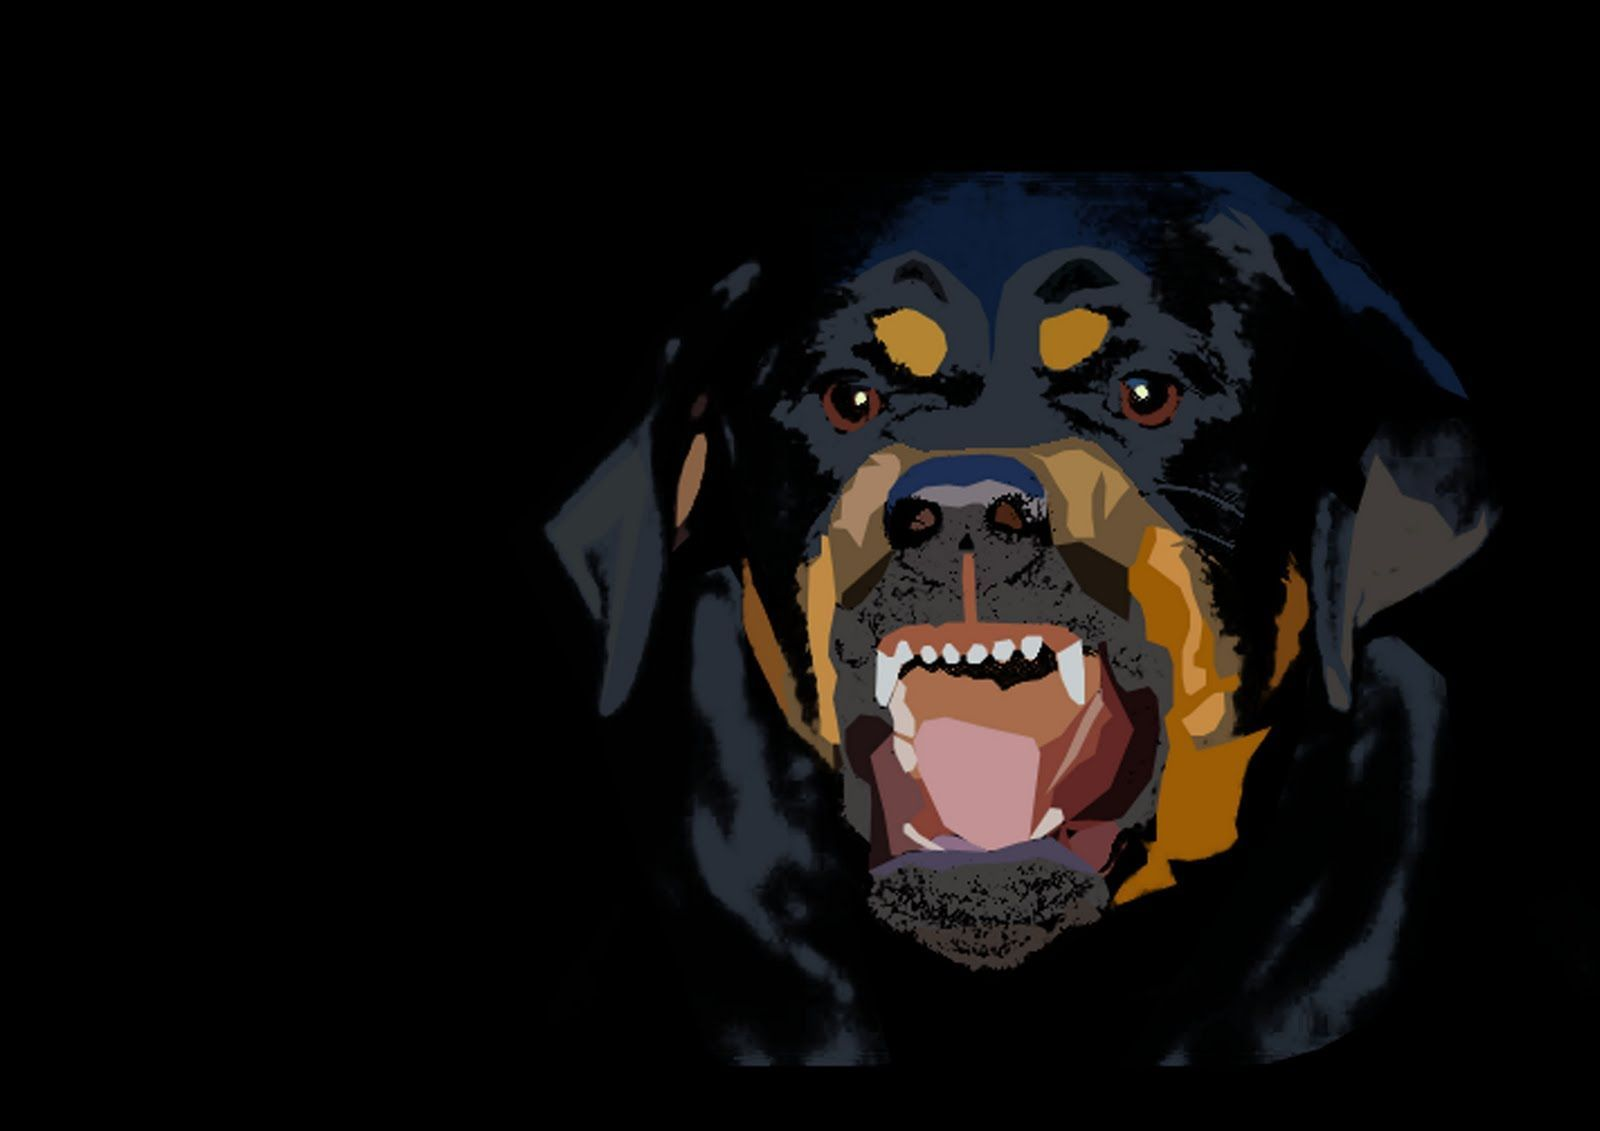 Download Givenchy Dog Wallpaper Gallery Dog Wallpaper Rottweiler Givenchy Dog